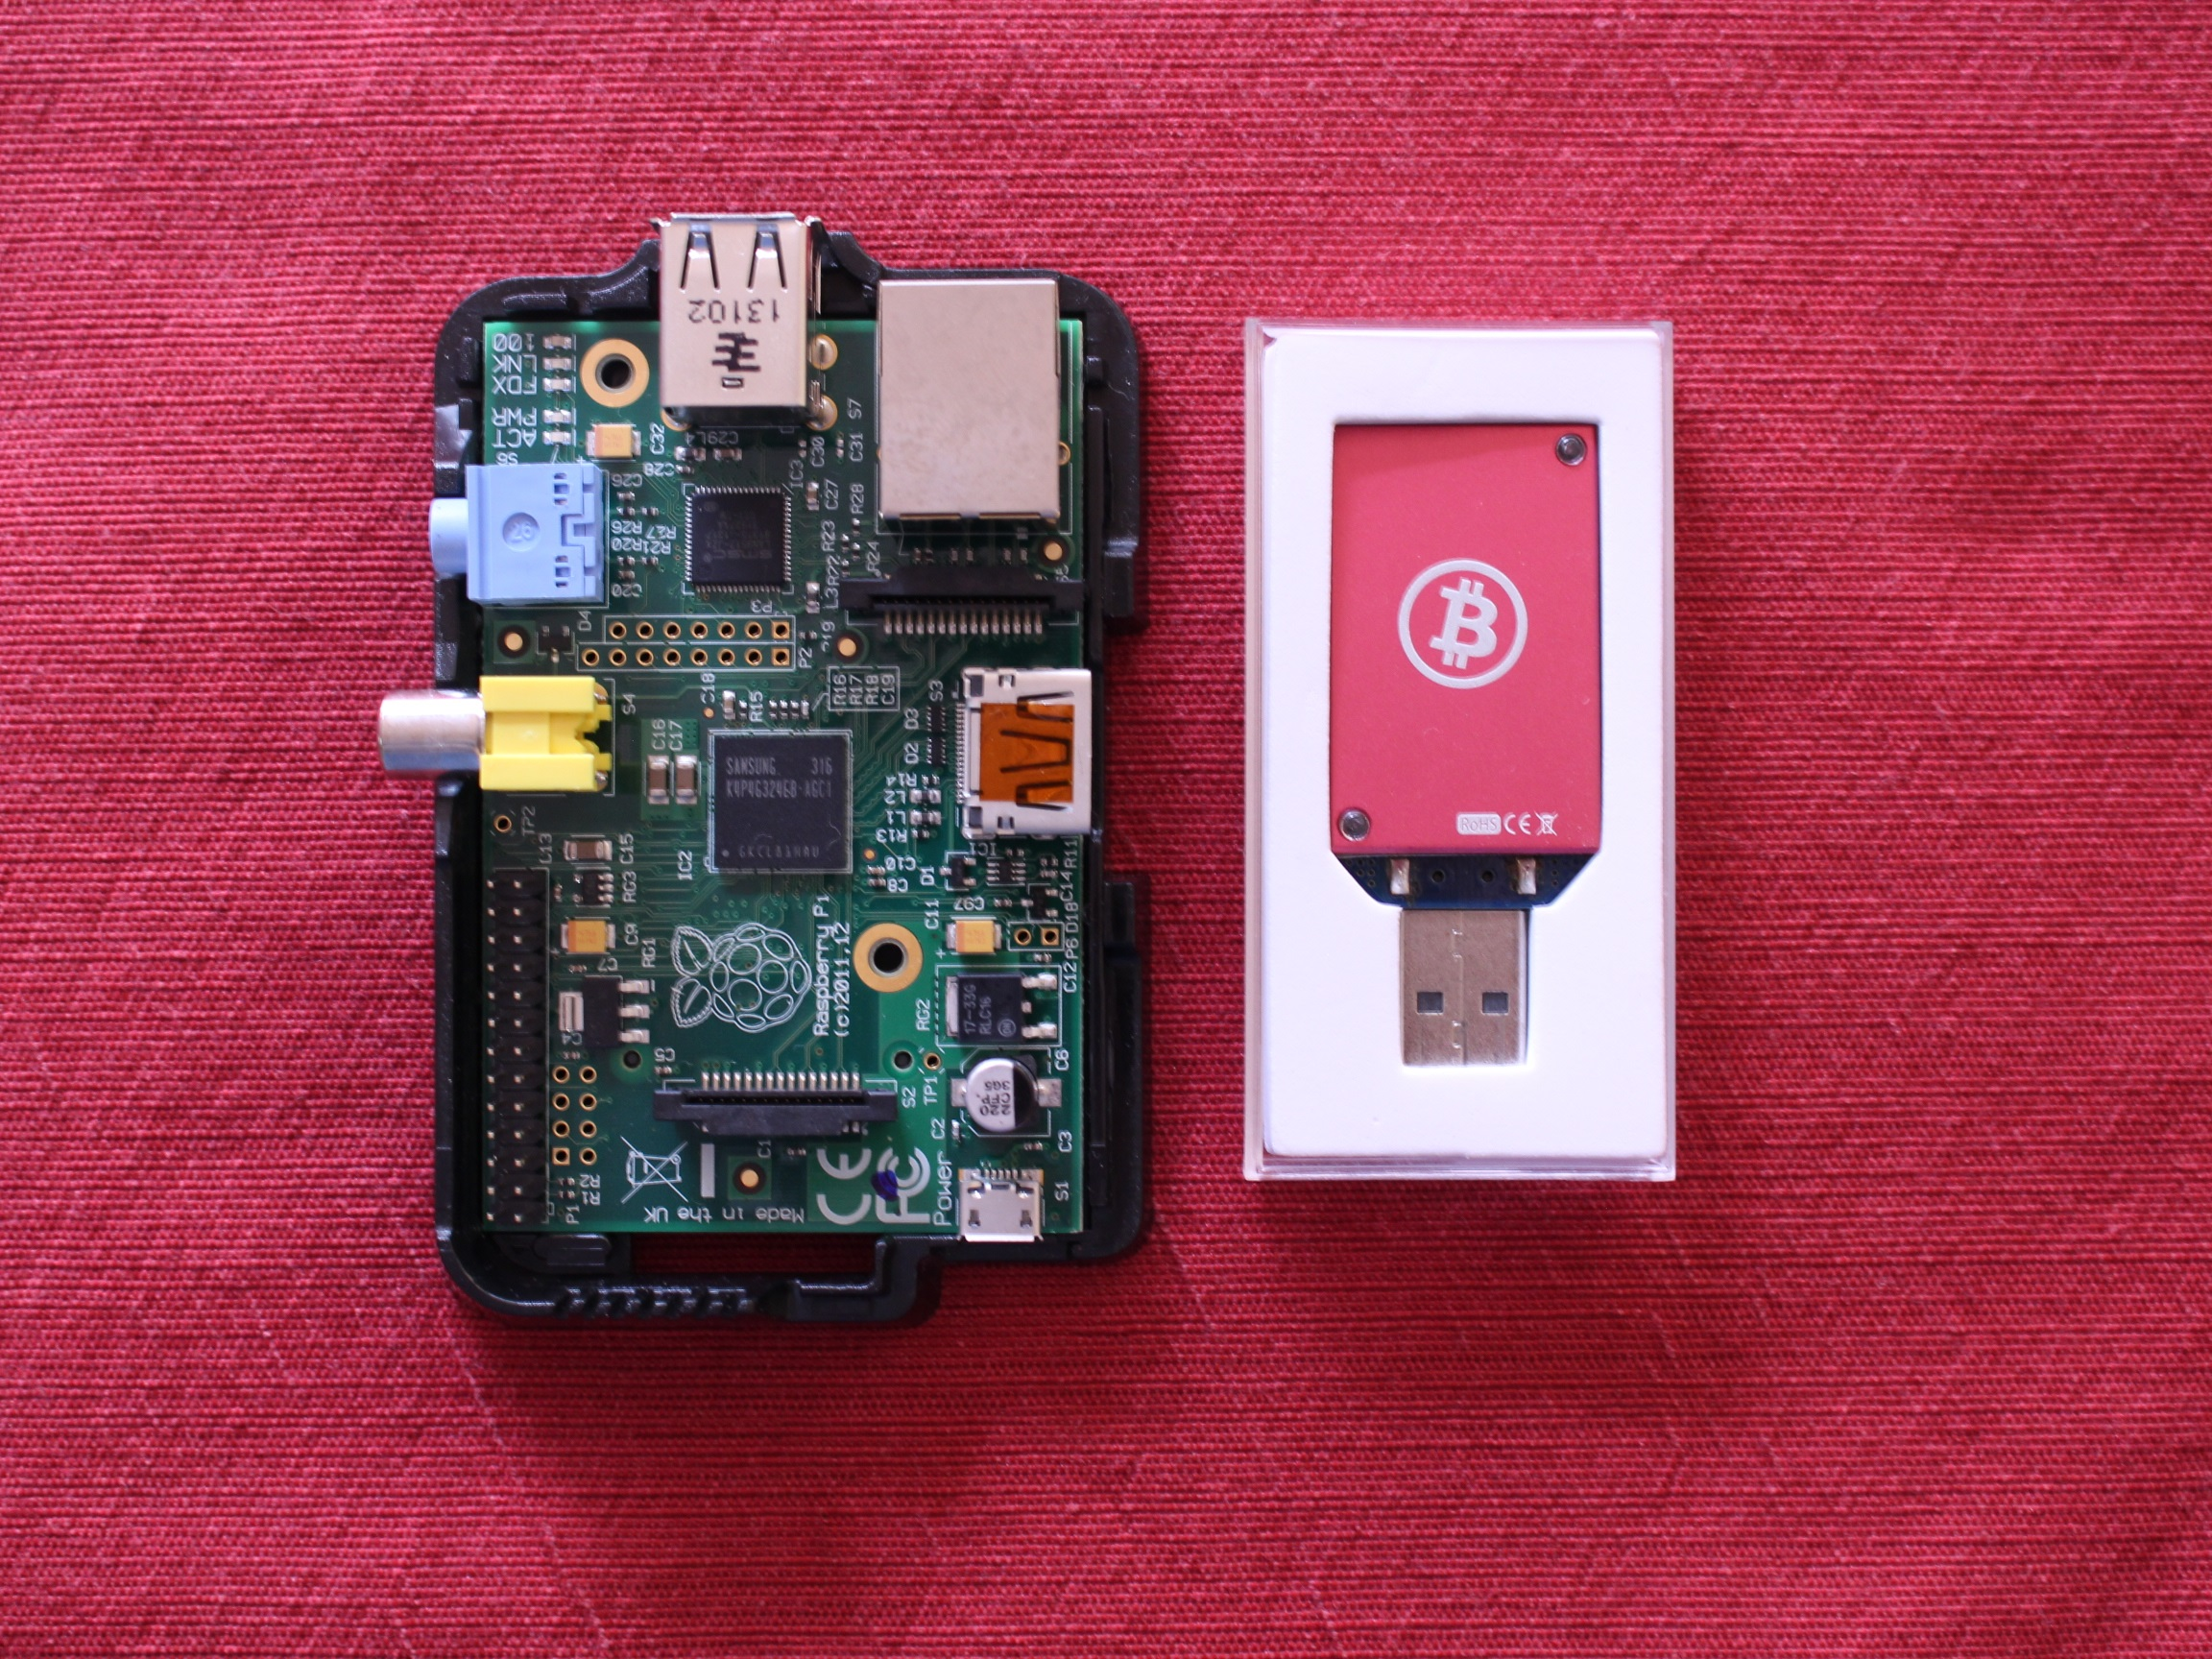 Raspberry Pi and Block Erupter